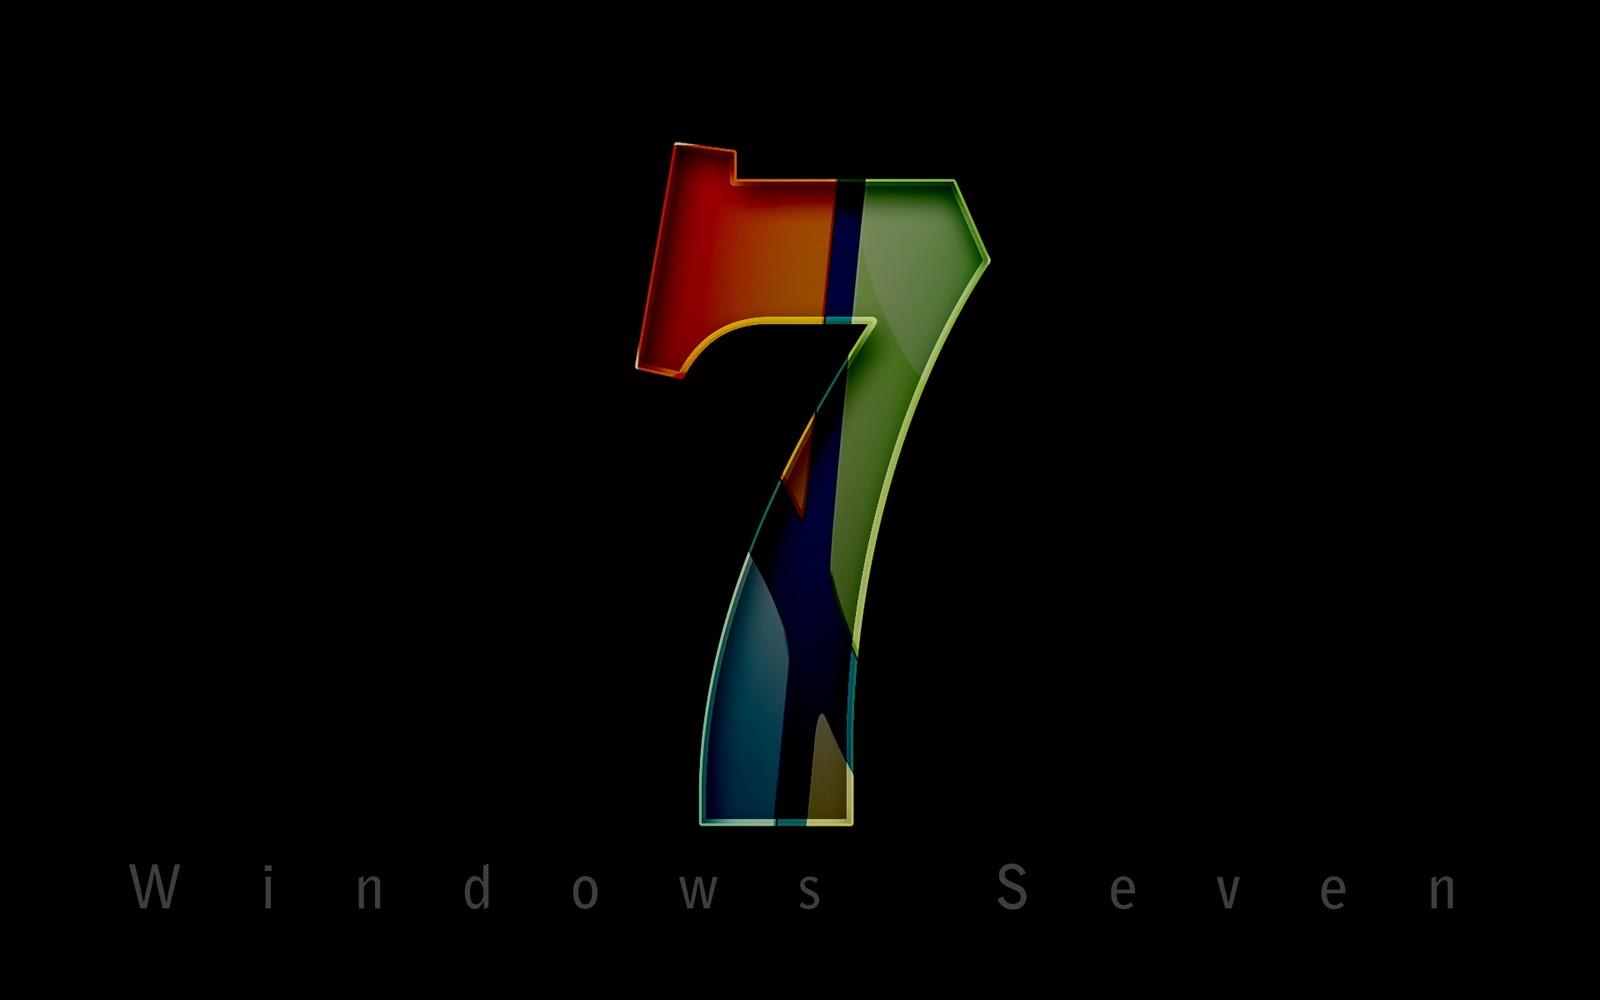 QQ Wallpapers: Seven Cool Windows 7 Wallpaper / Backgrounds